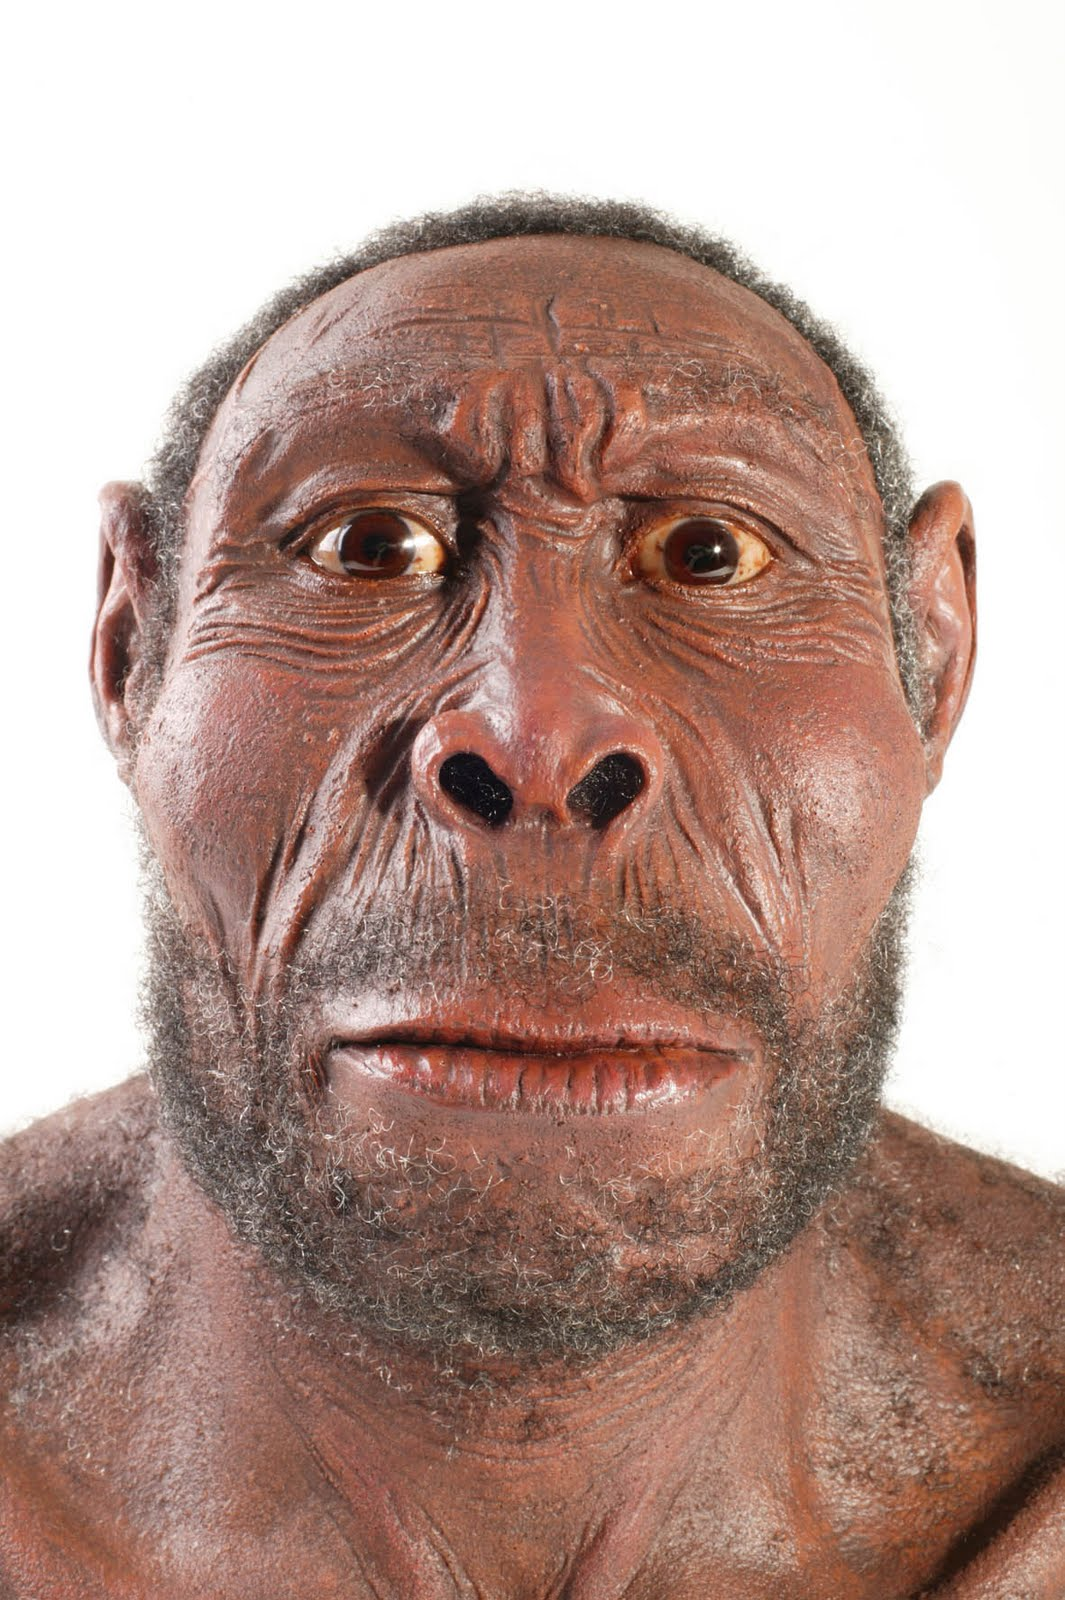 how tall is homo erectus